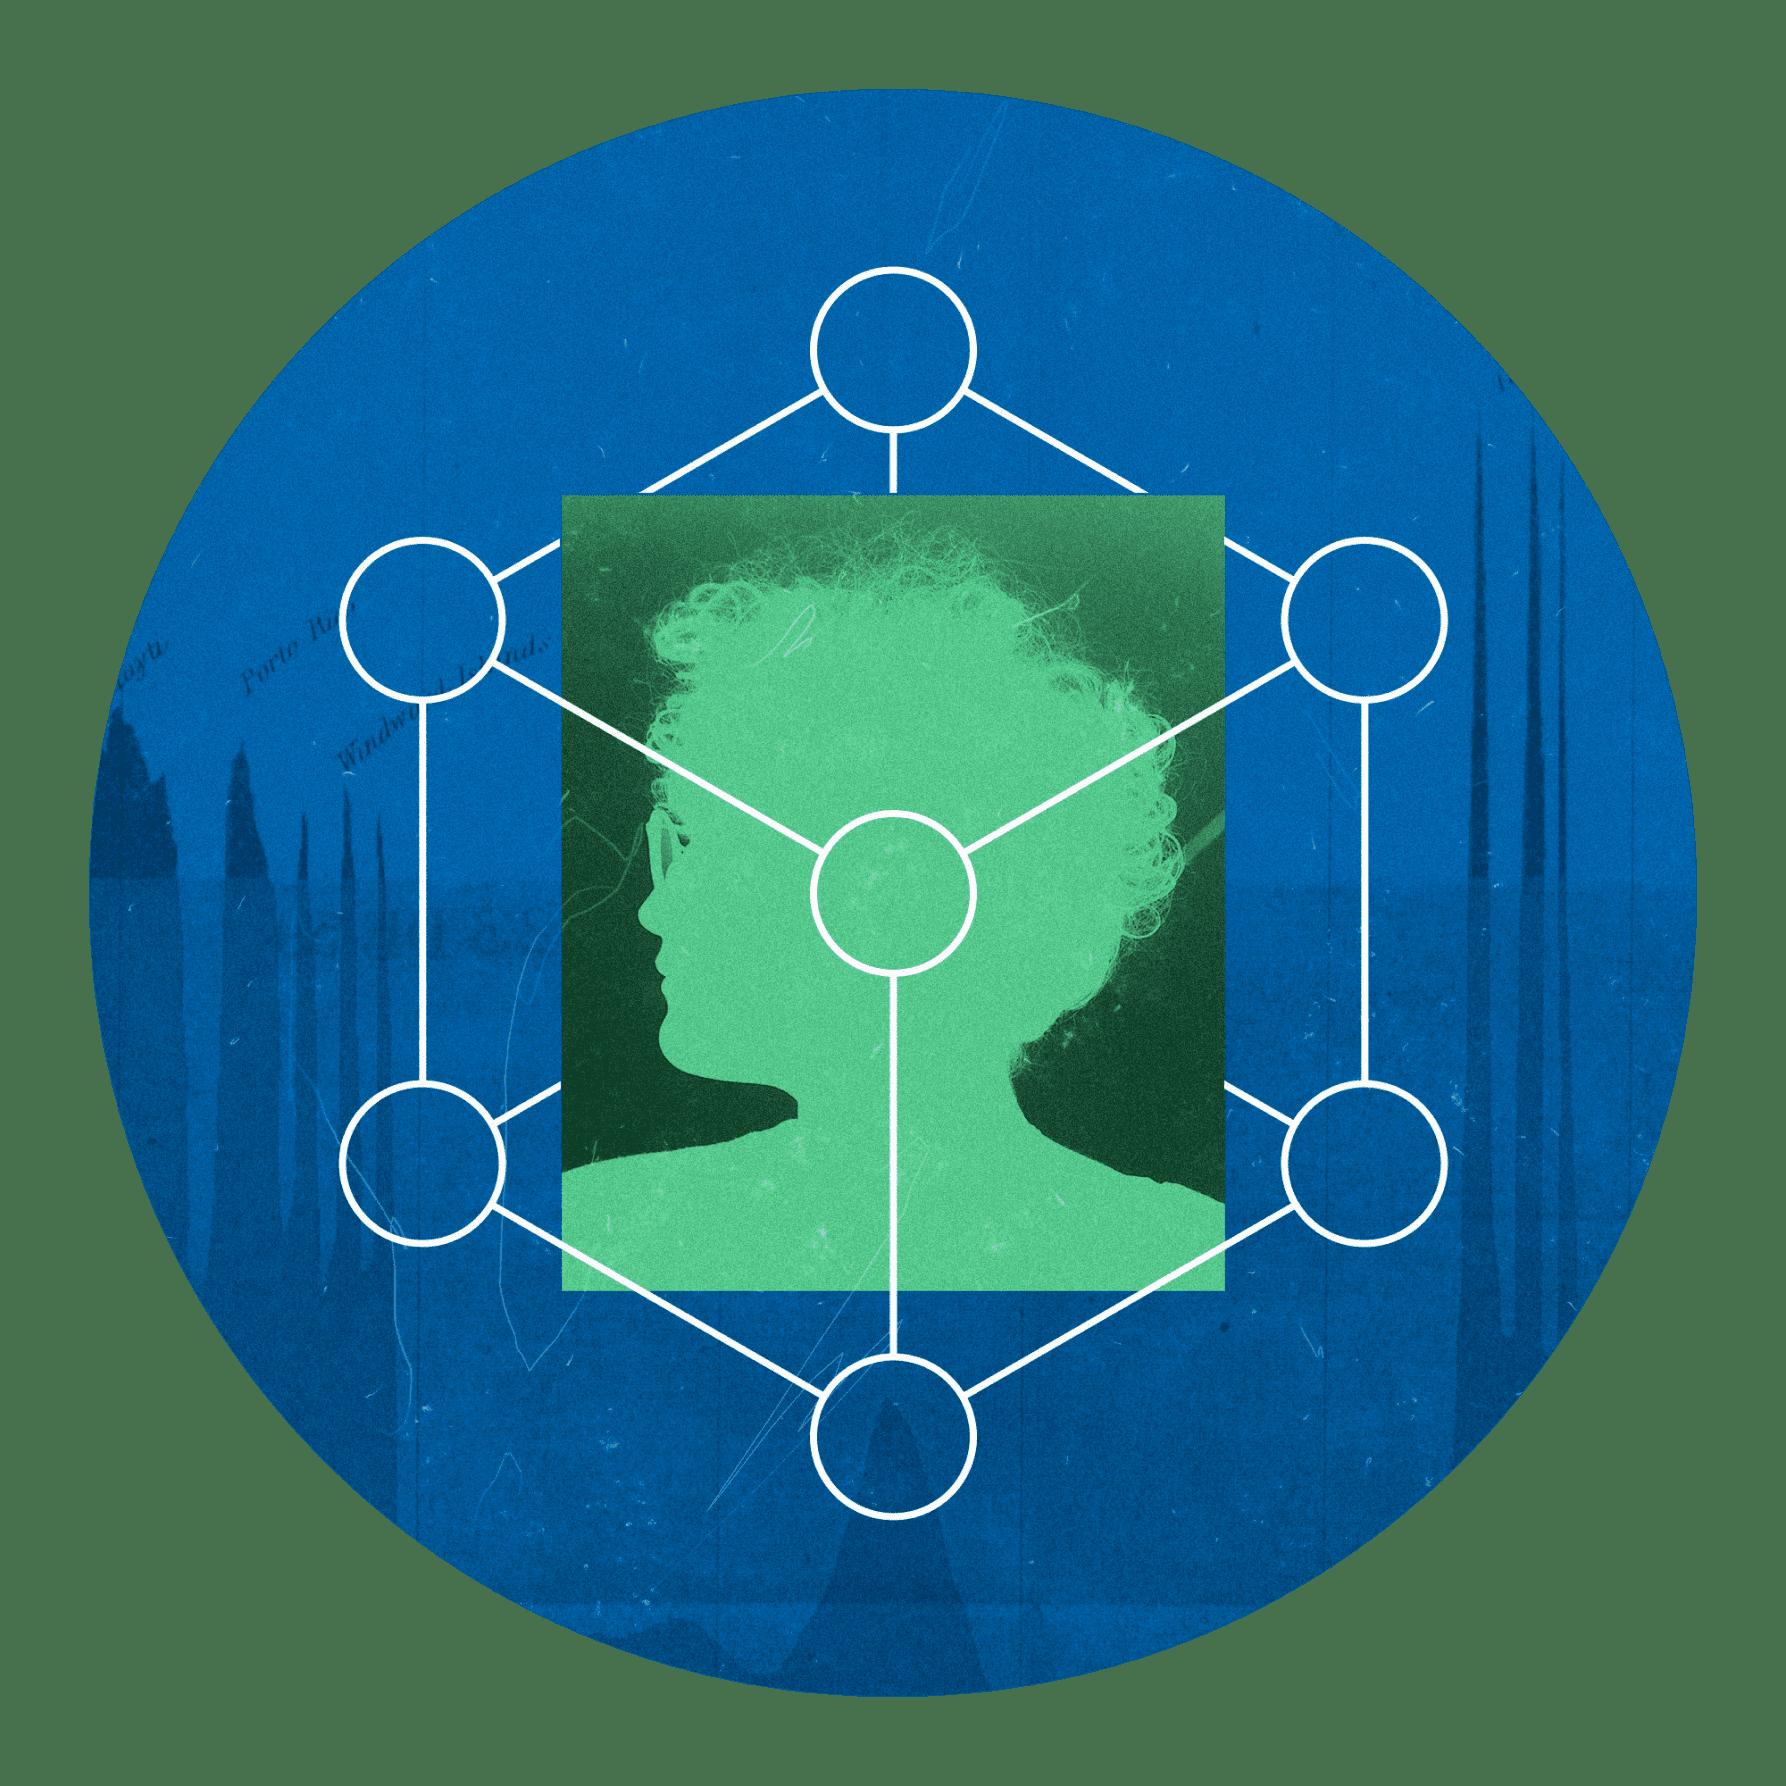 Technology & Innovation icon